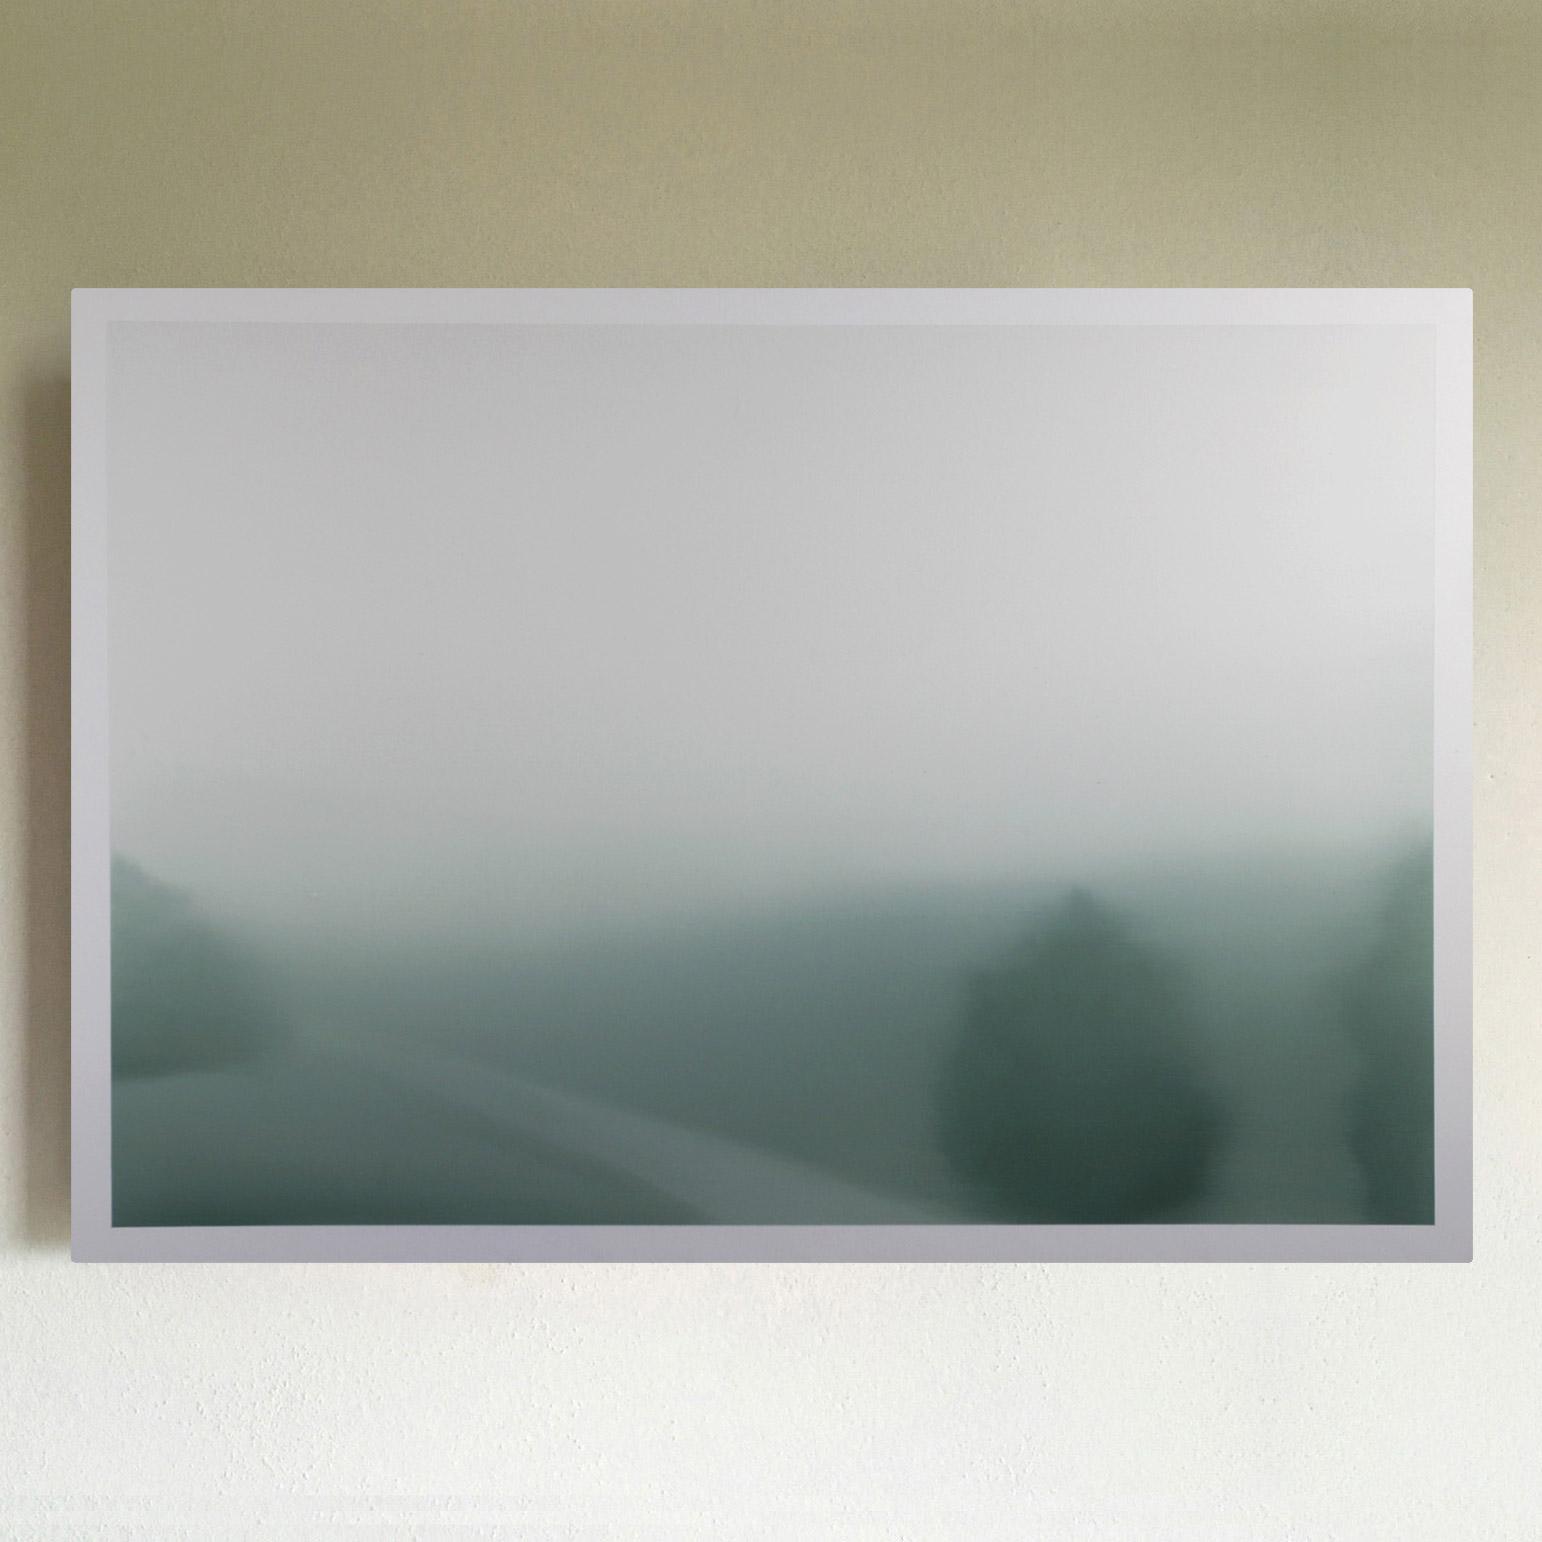 T#52-2009, oil on canvas, 70x100cm, priv. coll.